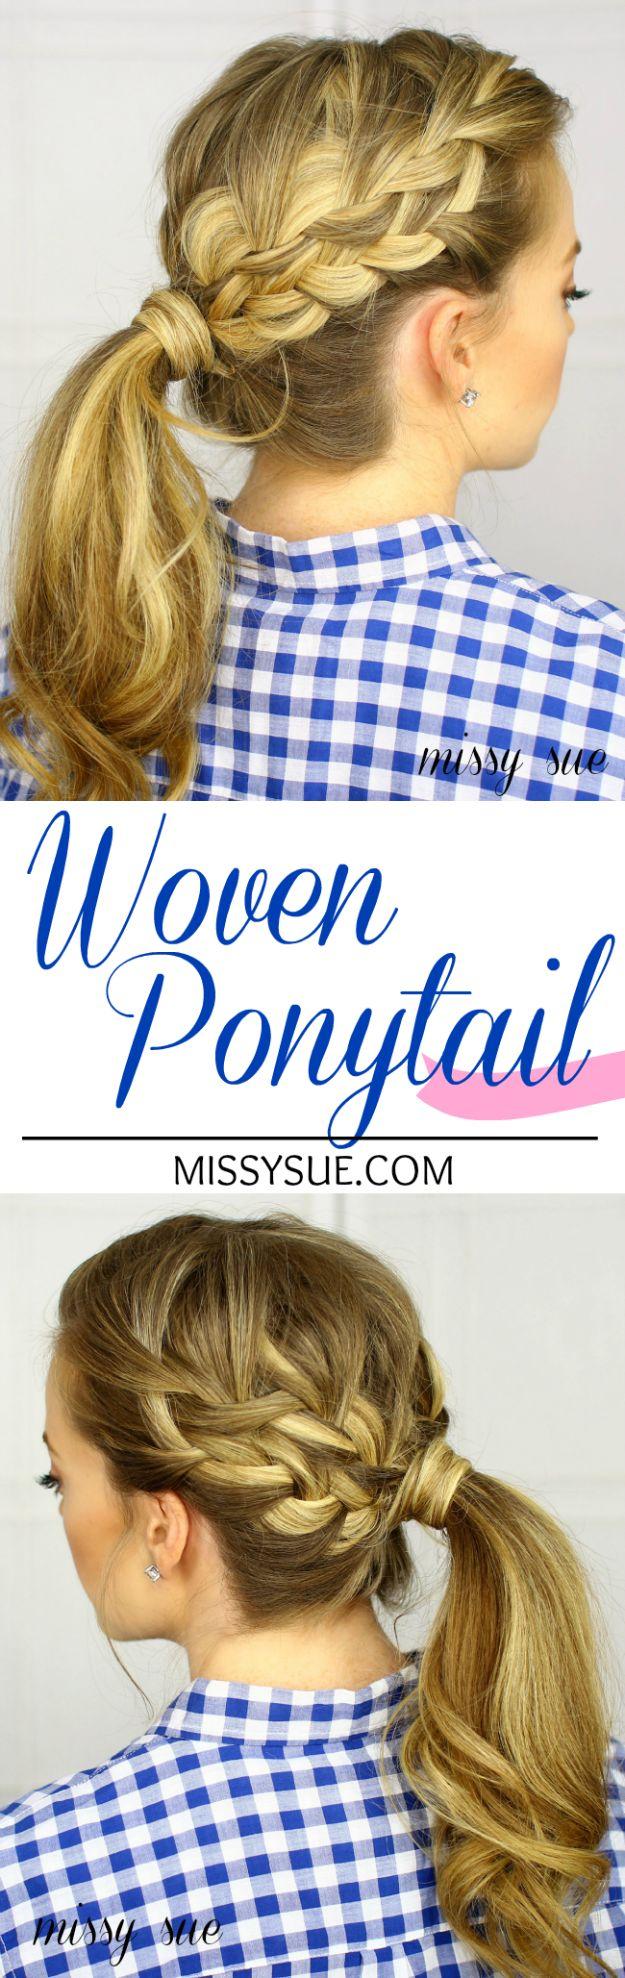 Woven-Ponytail-Tutorial